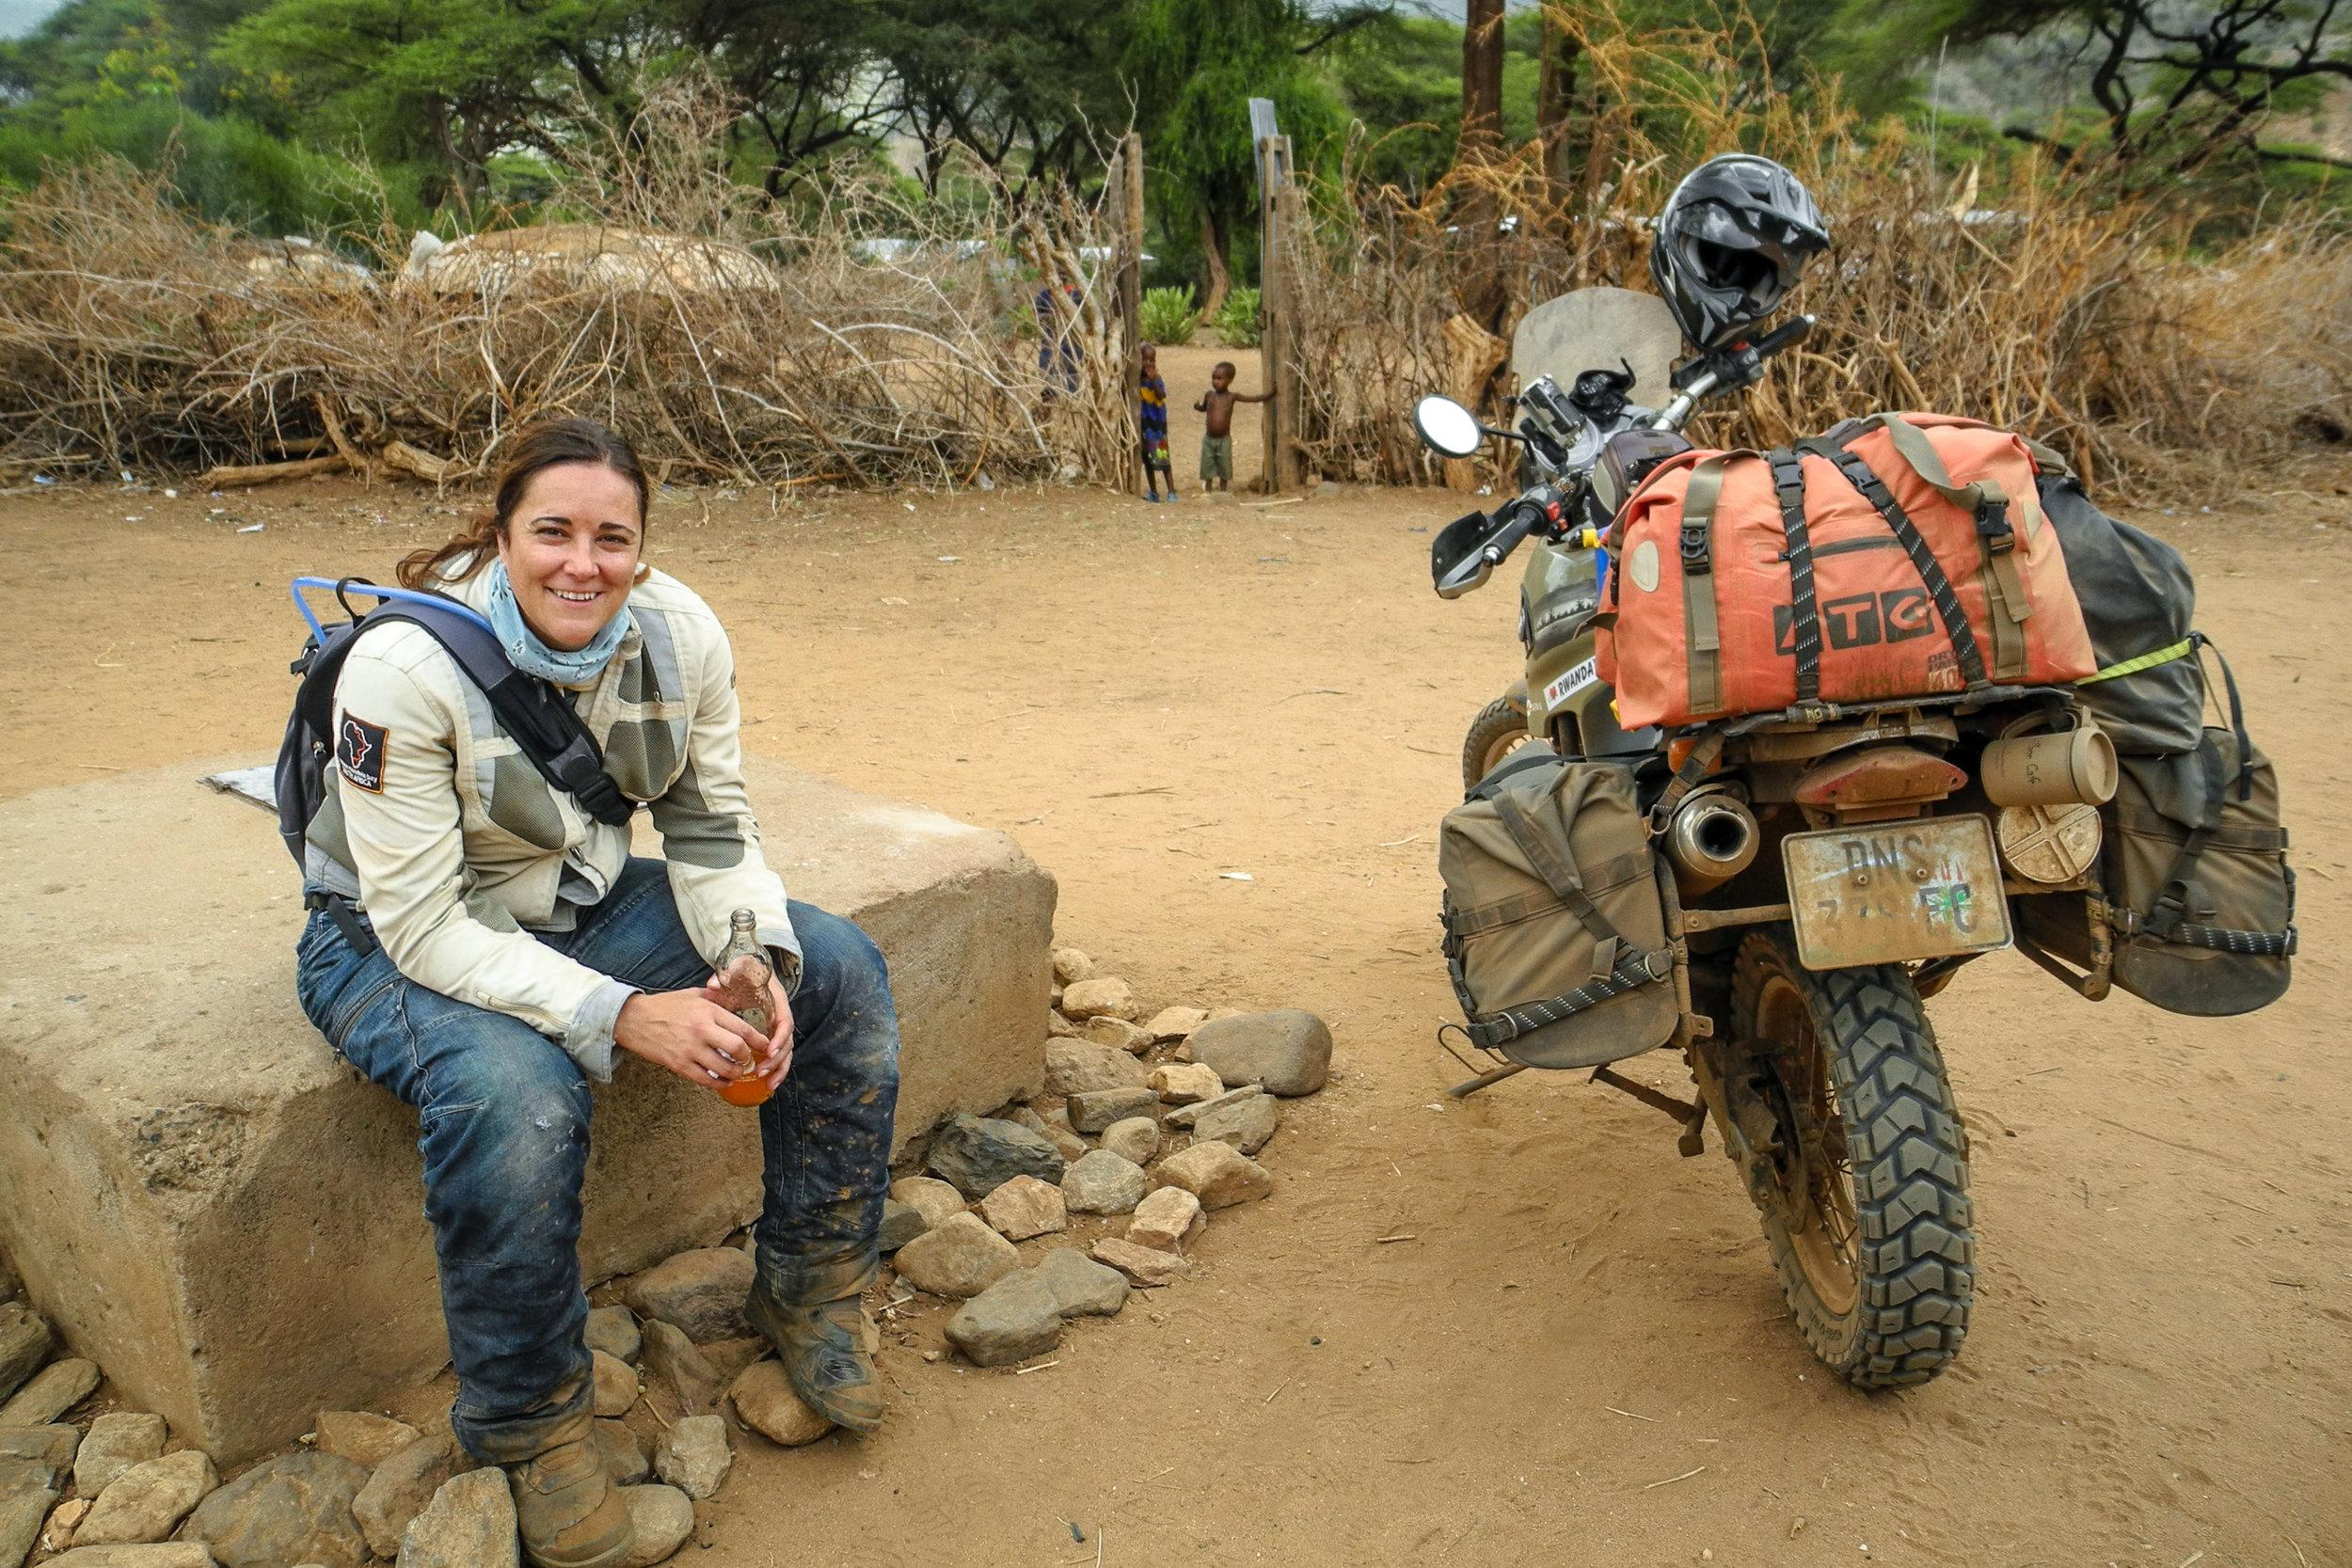 michnus-elsebie-olivier-pikipiki-overland-adventure-rider-radio-motorcycle-podcast-5.jpg